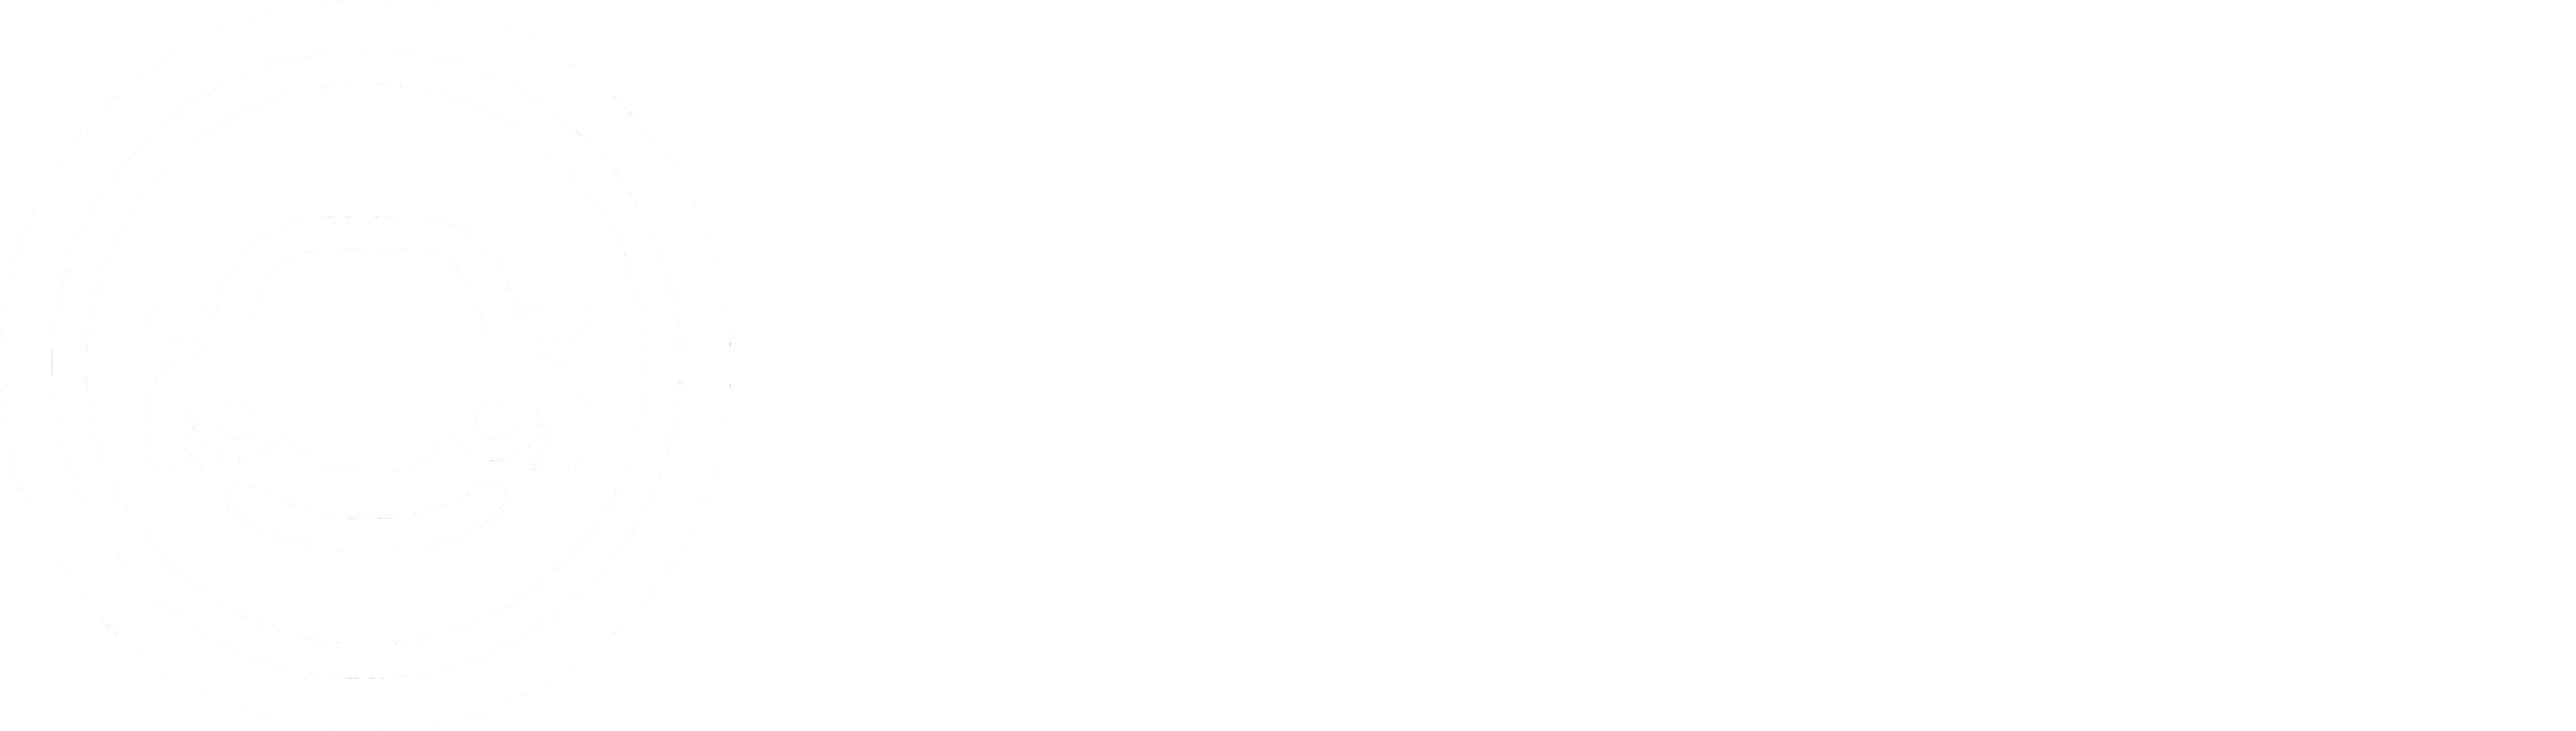 AutoCopain